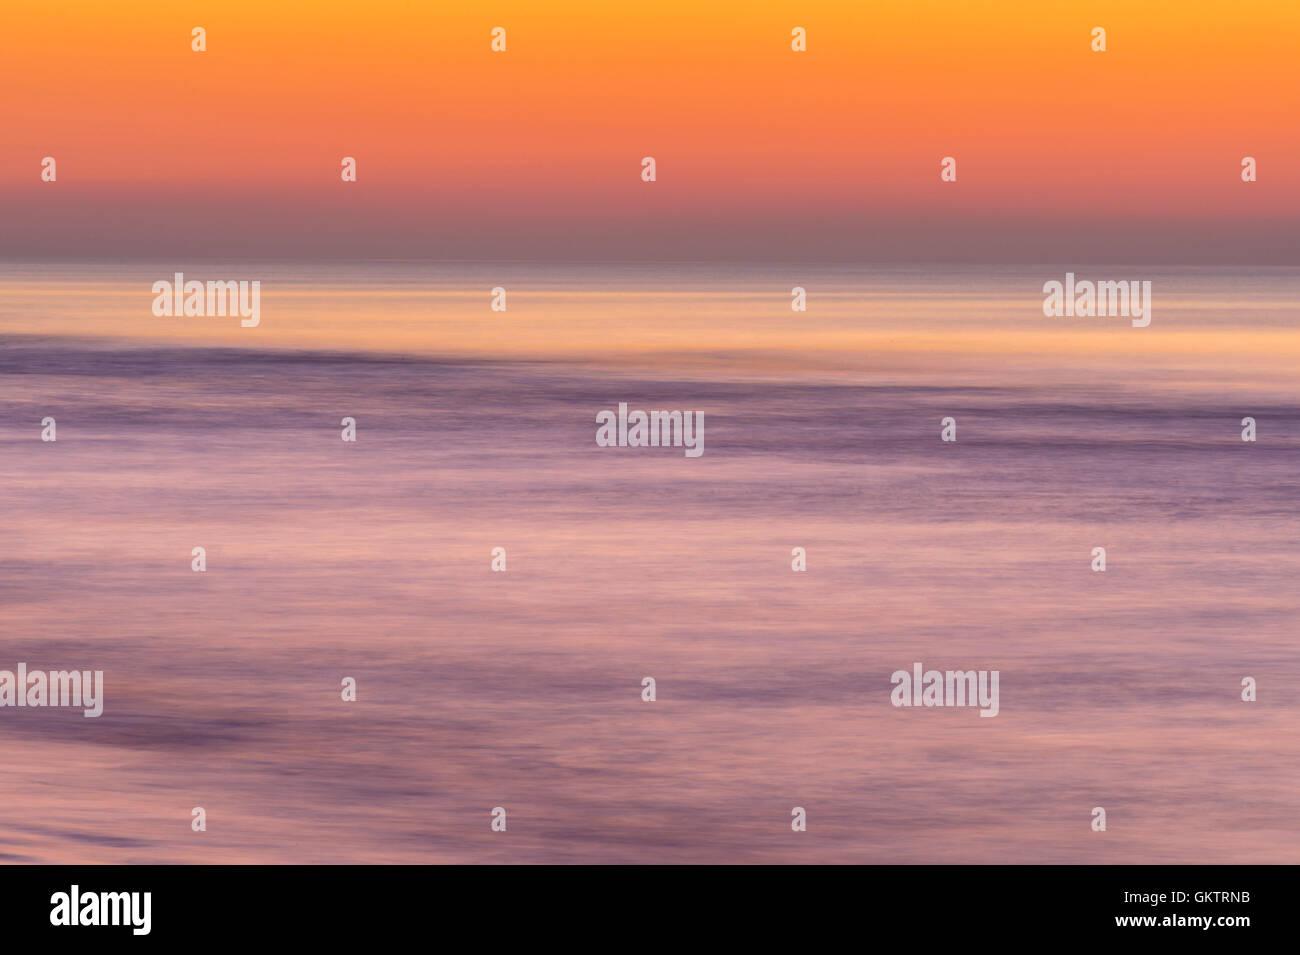 Artistico Oceano Sunrise Blur Immagini Stock